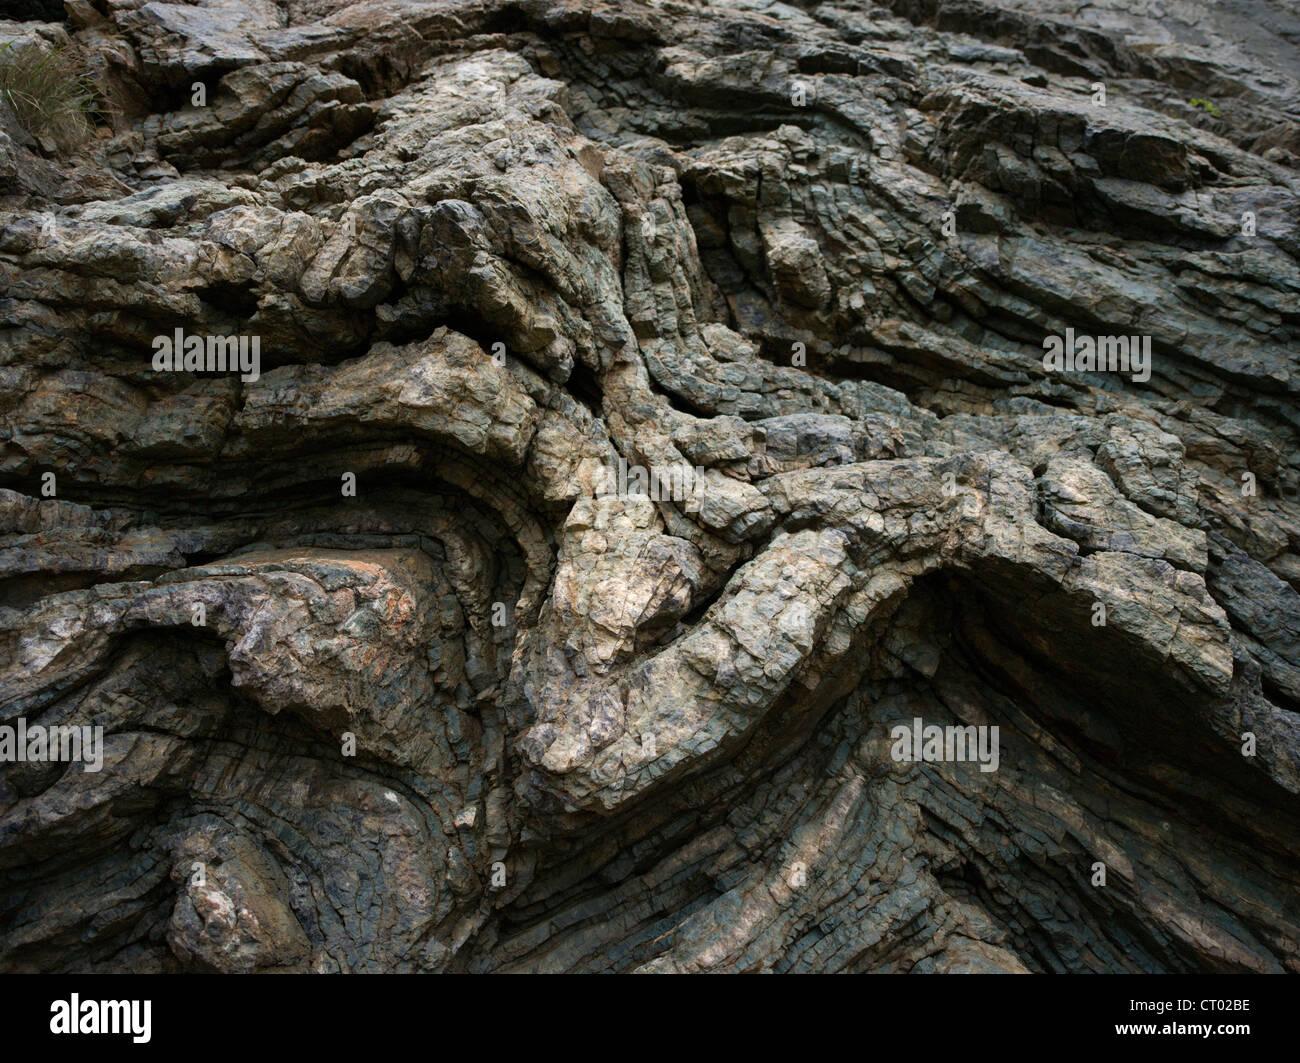 Rock Fold in sedimentary strata Okinawa, Japan - Stock Image